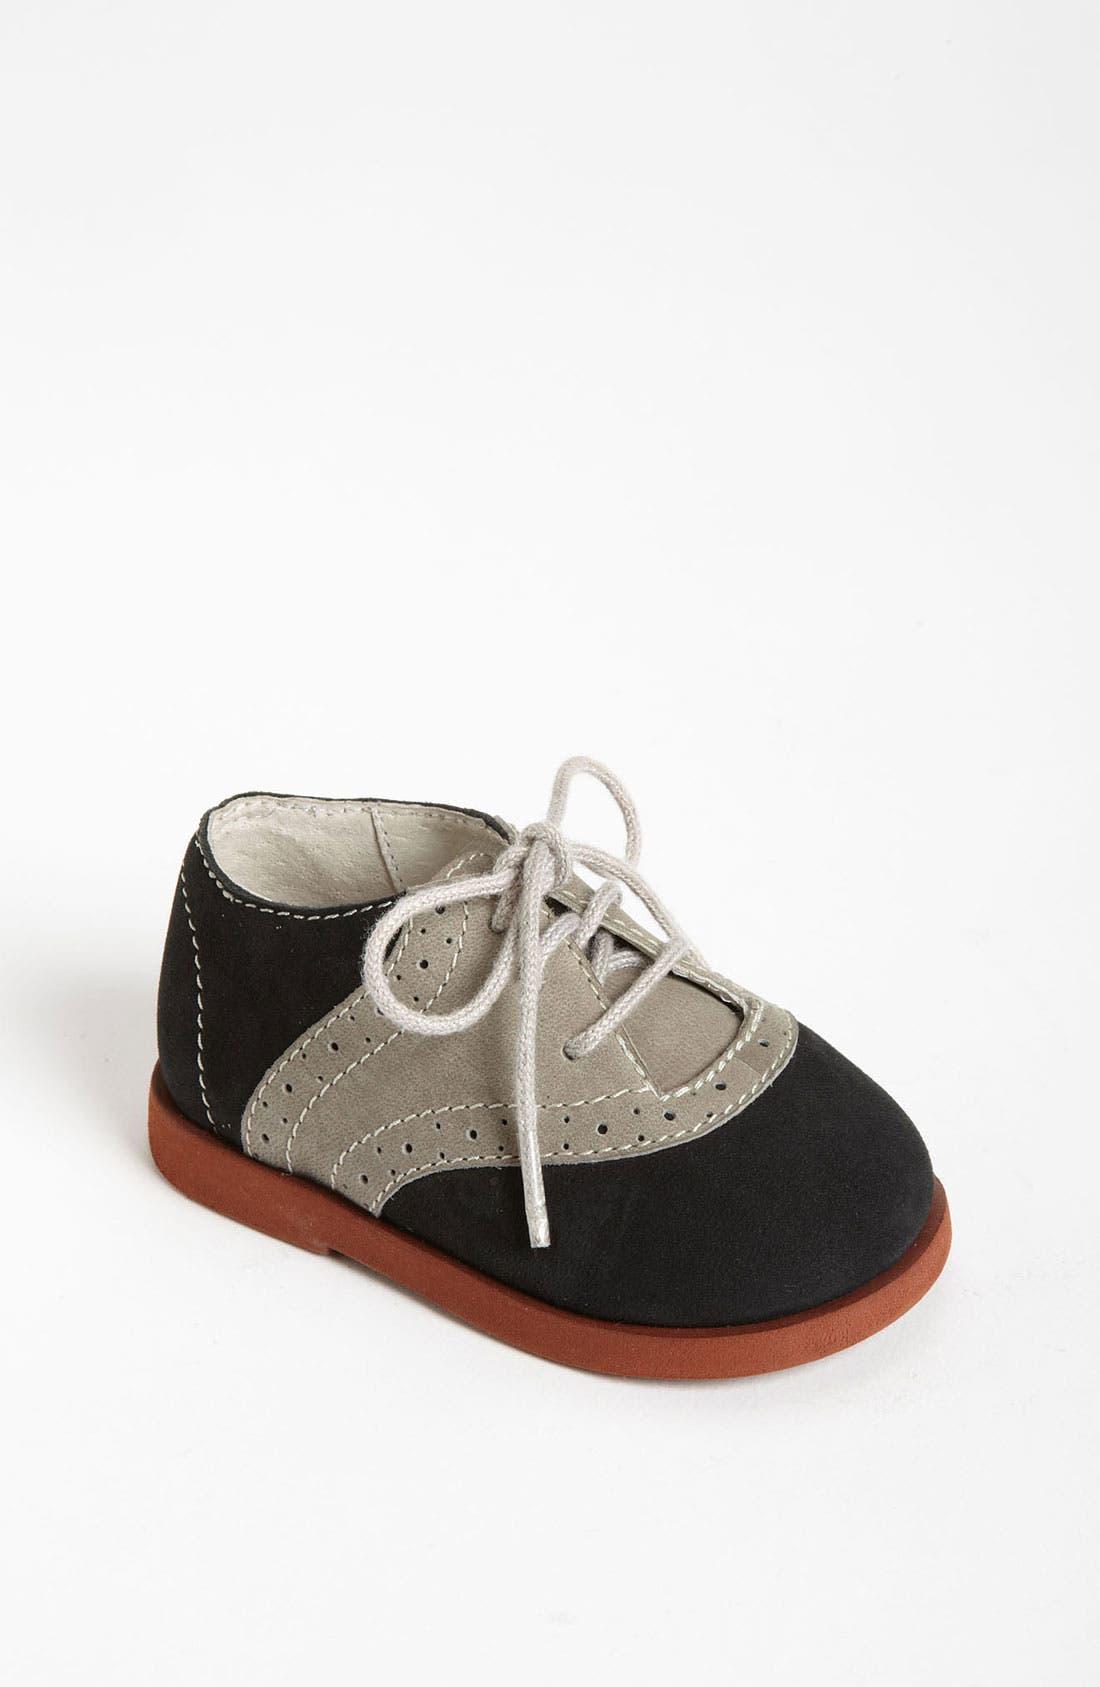 Main Image - Nordstrom Baby 'Wesley' Saddle Shoe (Baby)